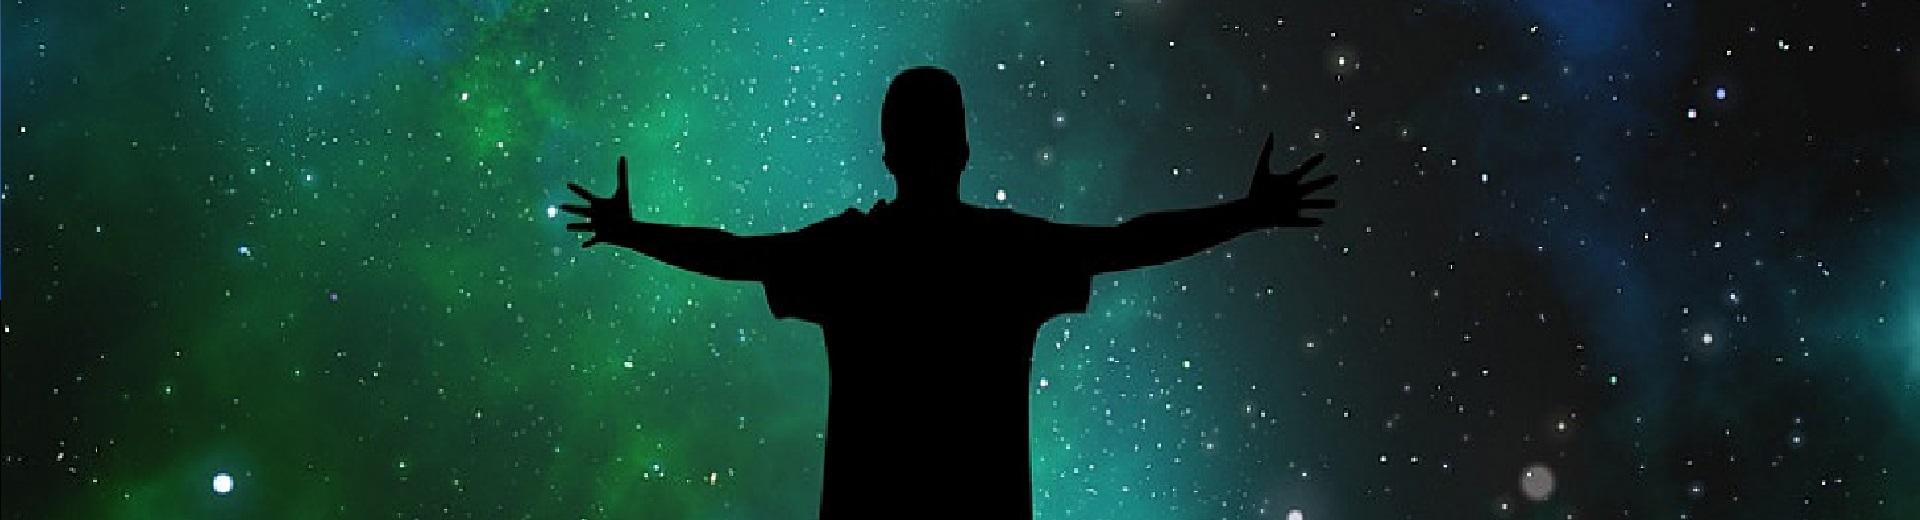 Портал КФУ \ Образование \ Институт физики \ Аспирантура и докторантура \ 01.03.02 - Астрофизика и звездная астрономия